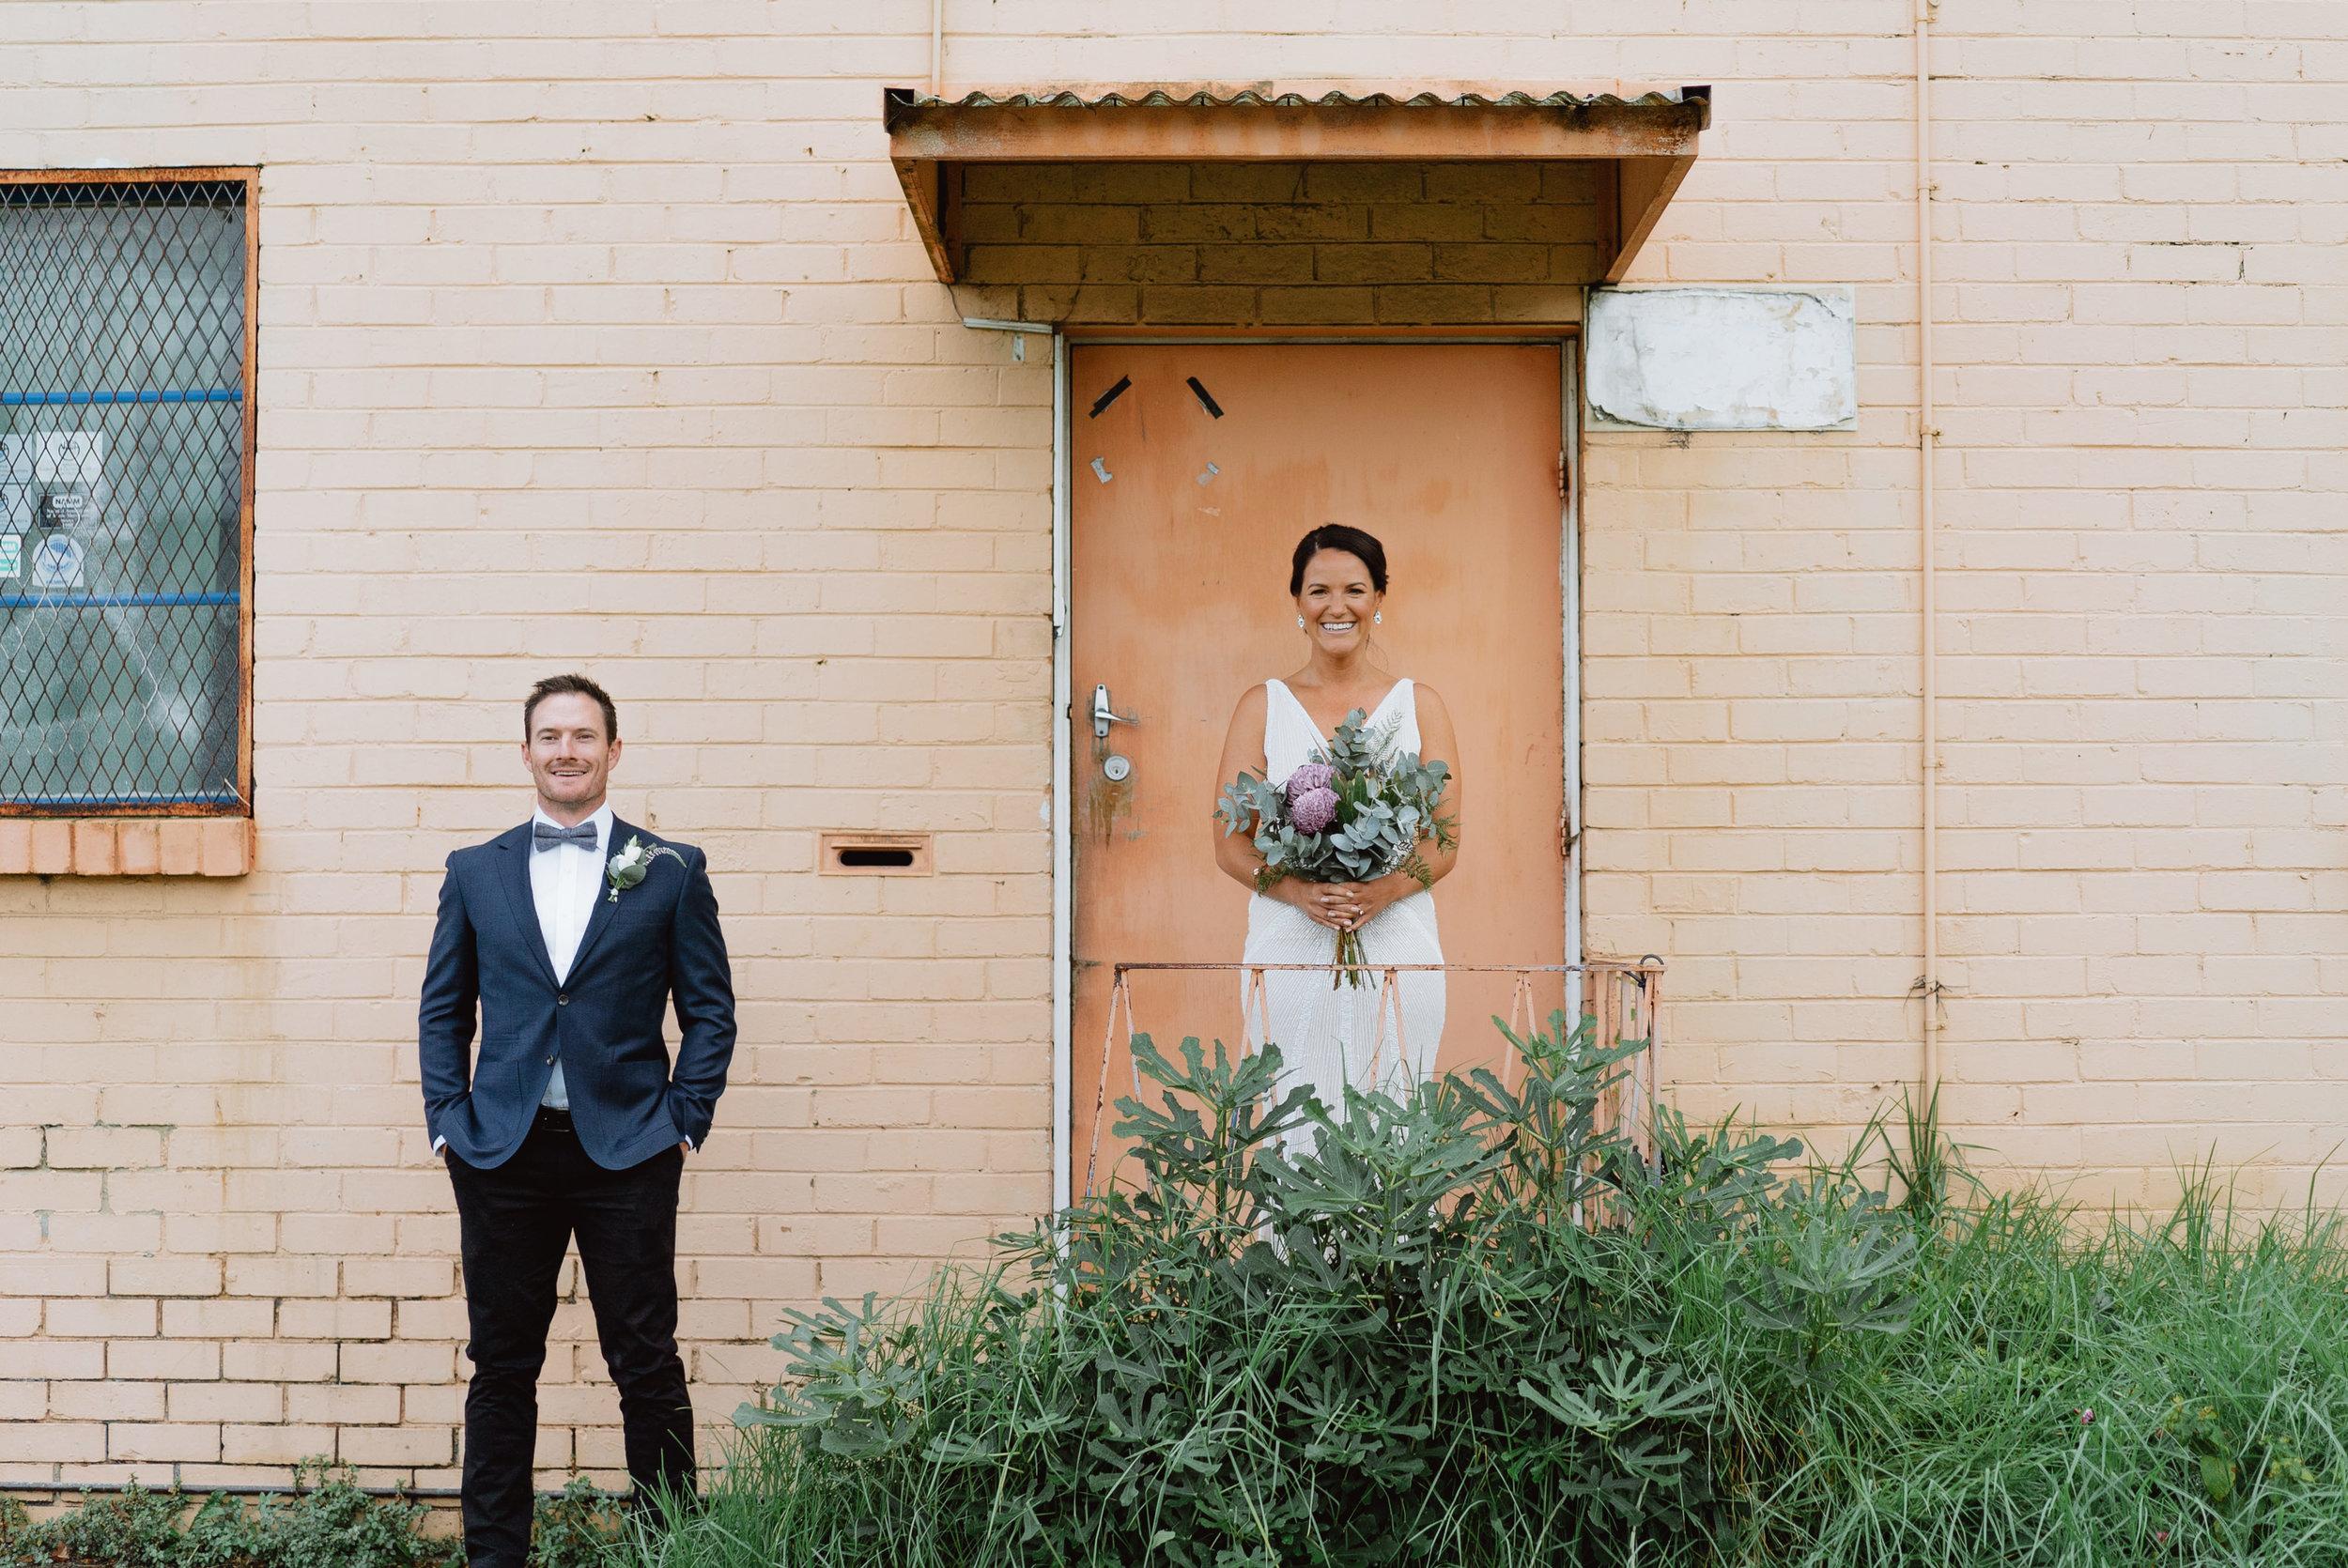 Wedding_Party_Portraits-56.jpg